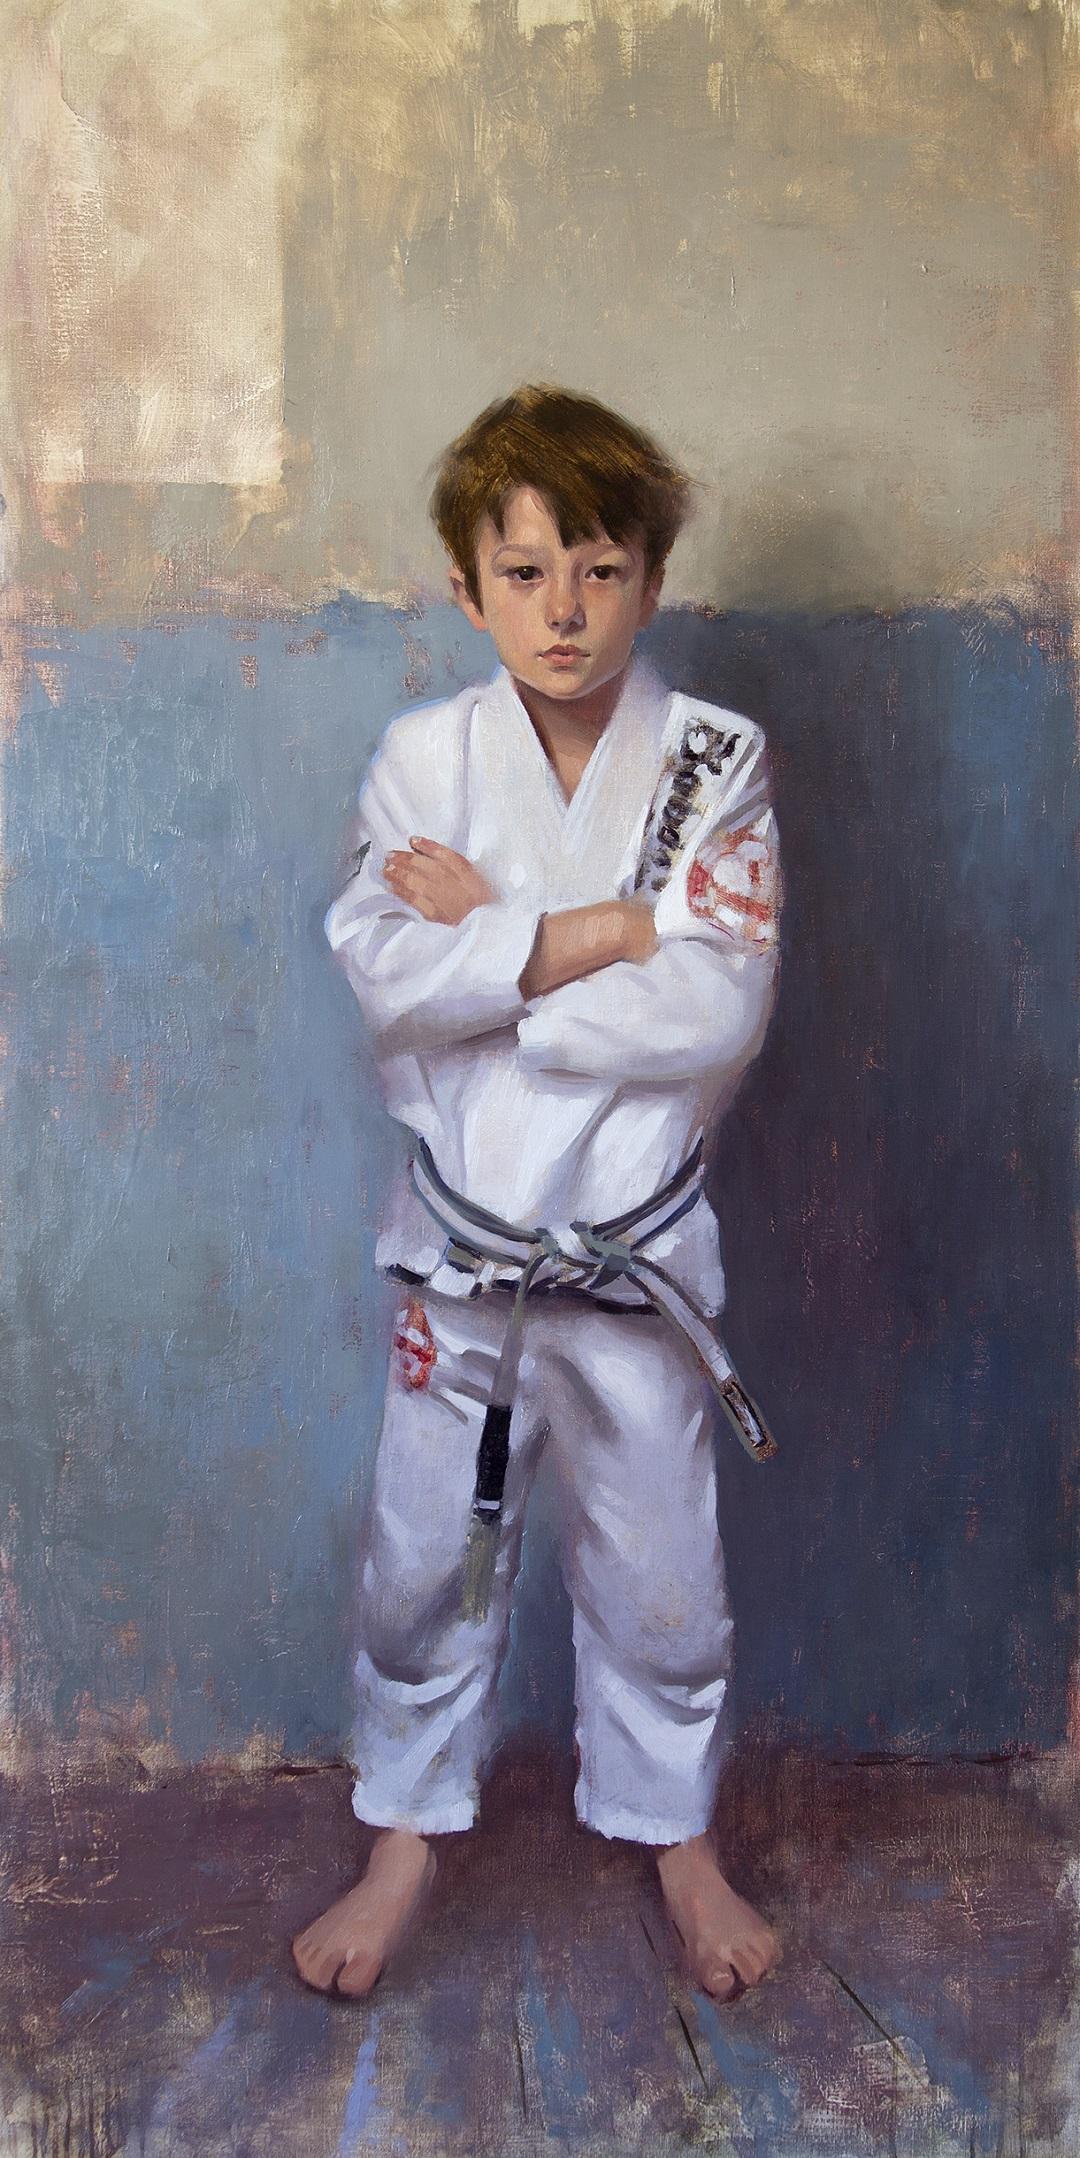 Boy in a White Gi, 2019 Alex Tzavaras Oil on Linen, 140 x 70 cm